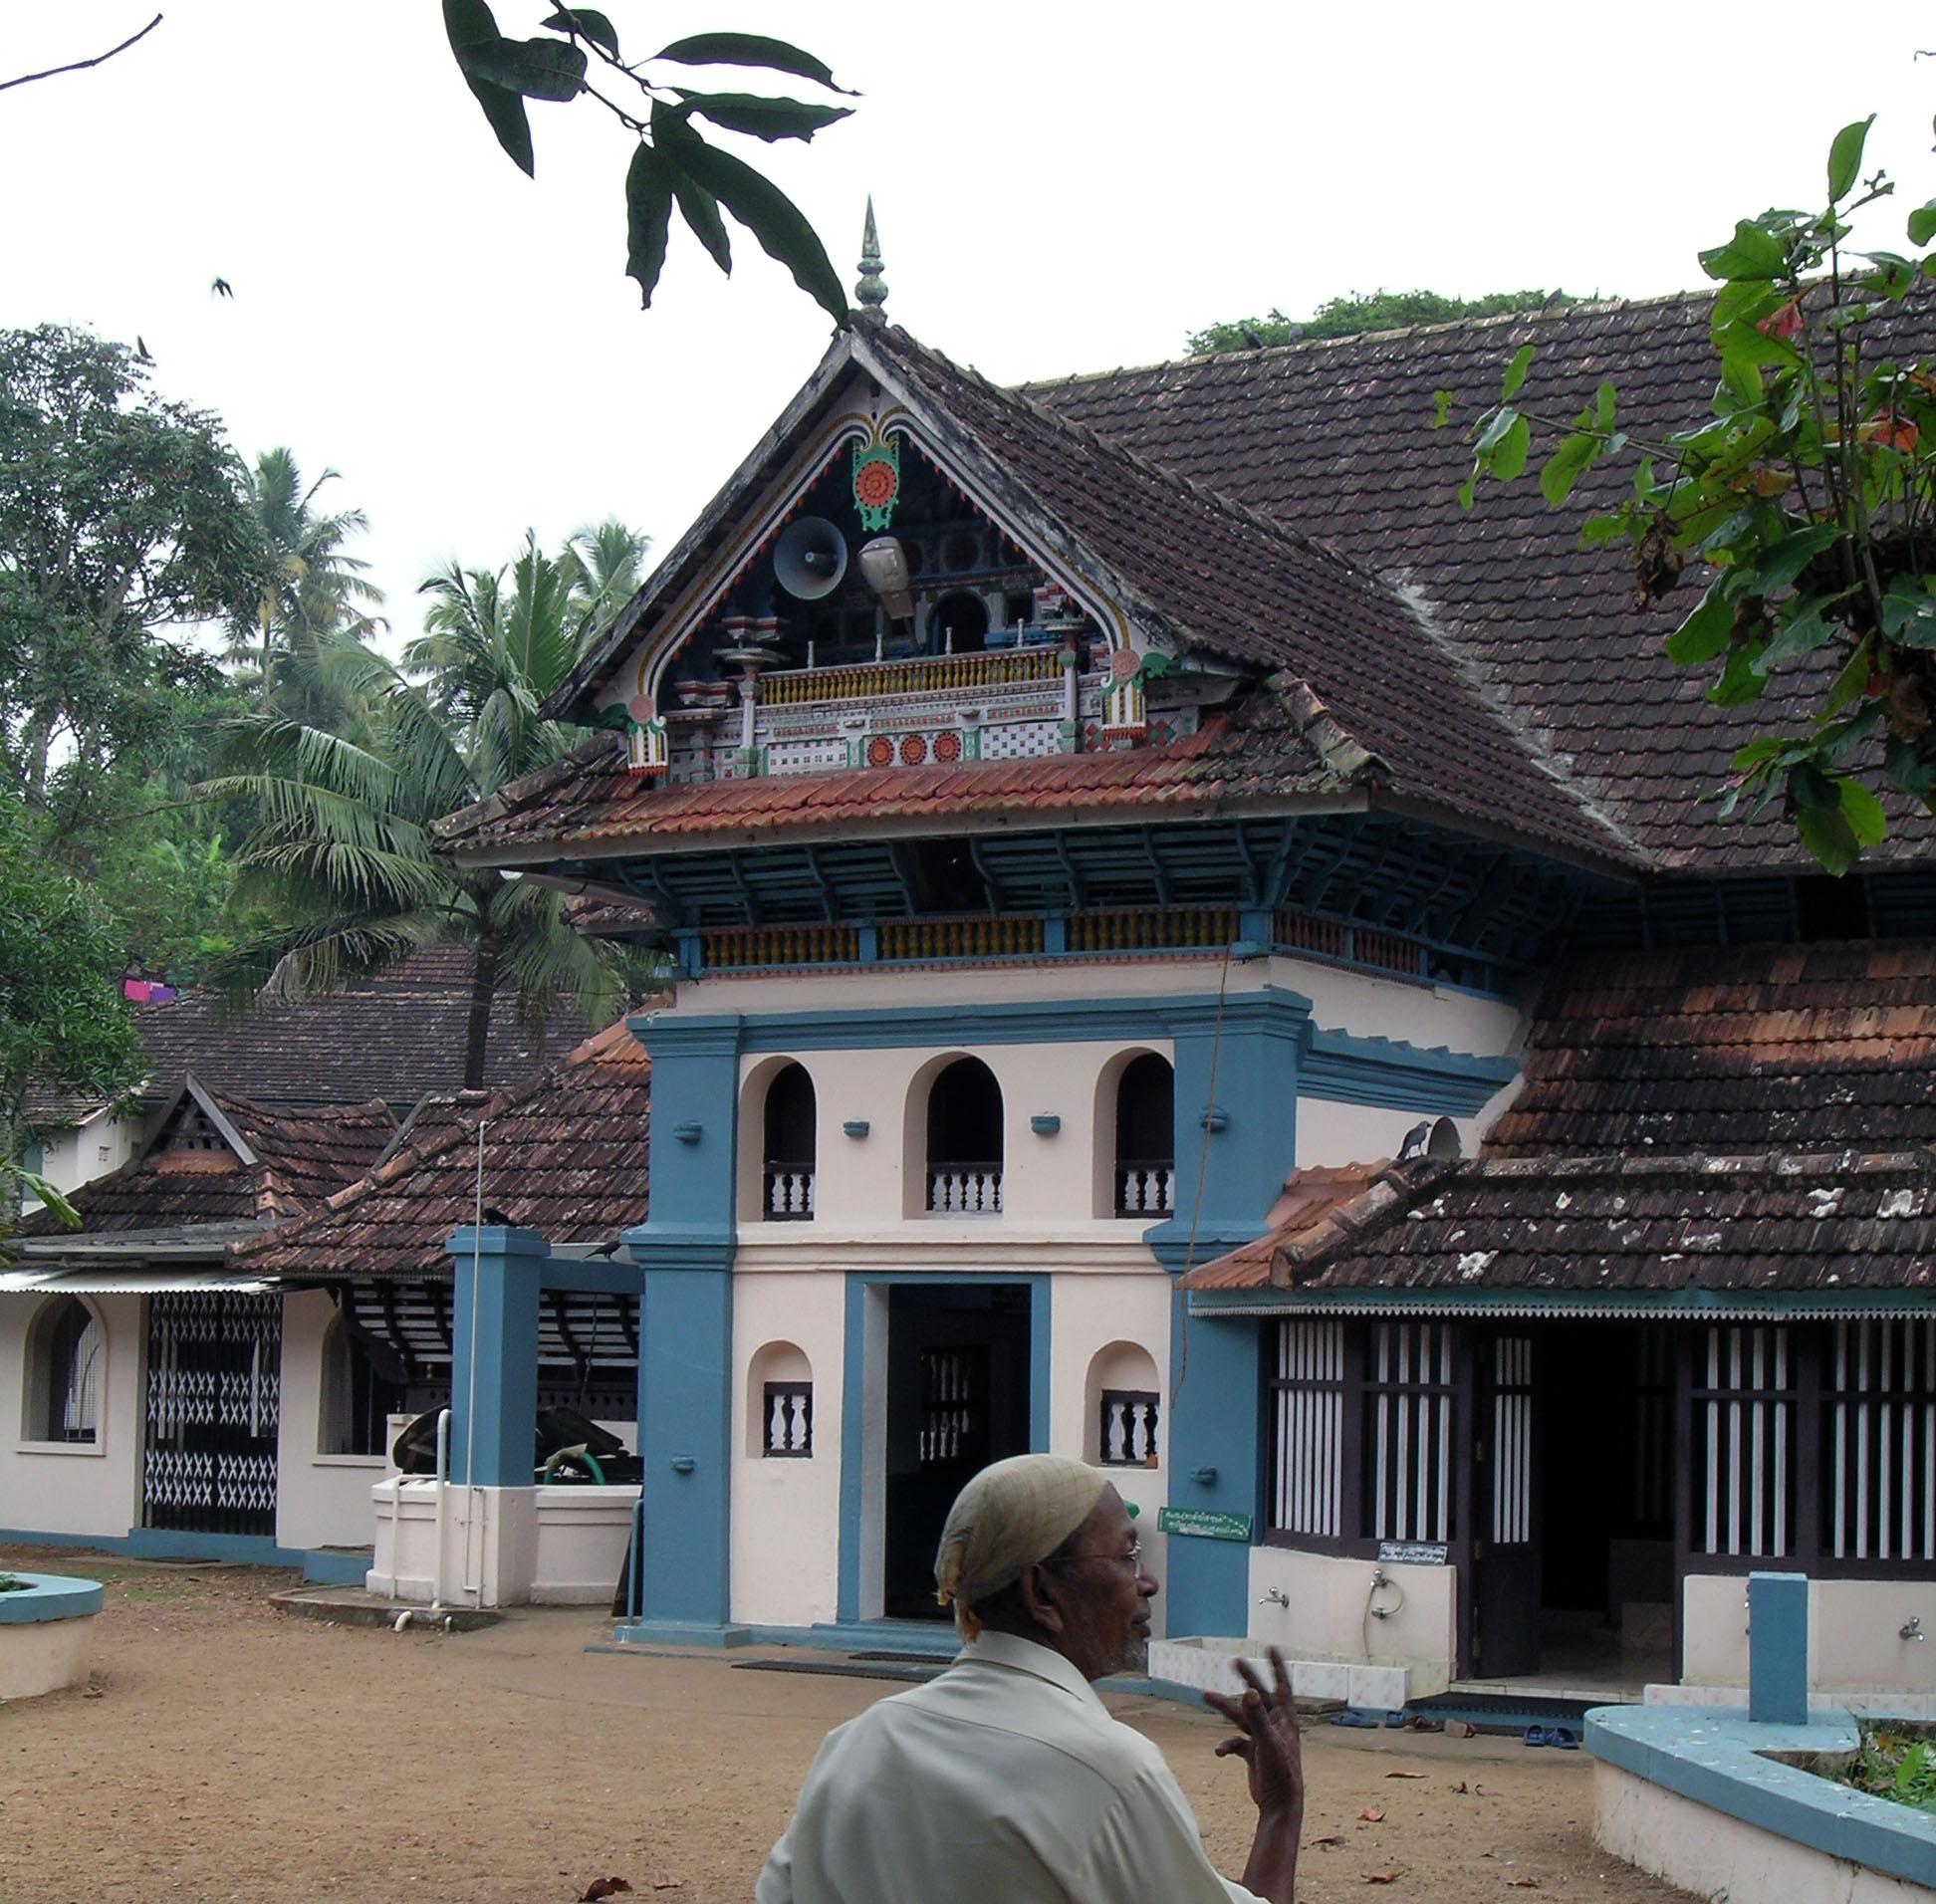 Top-rated Attraction in Kumarakom-Thazhathangadi Valiapalli